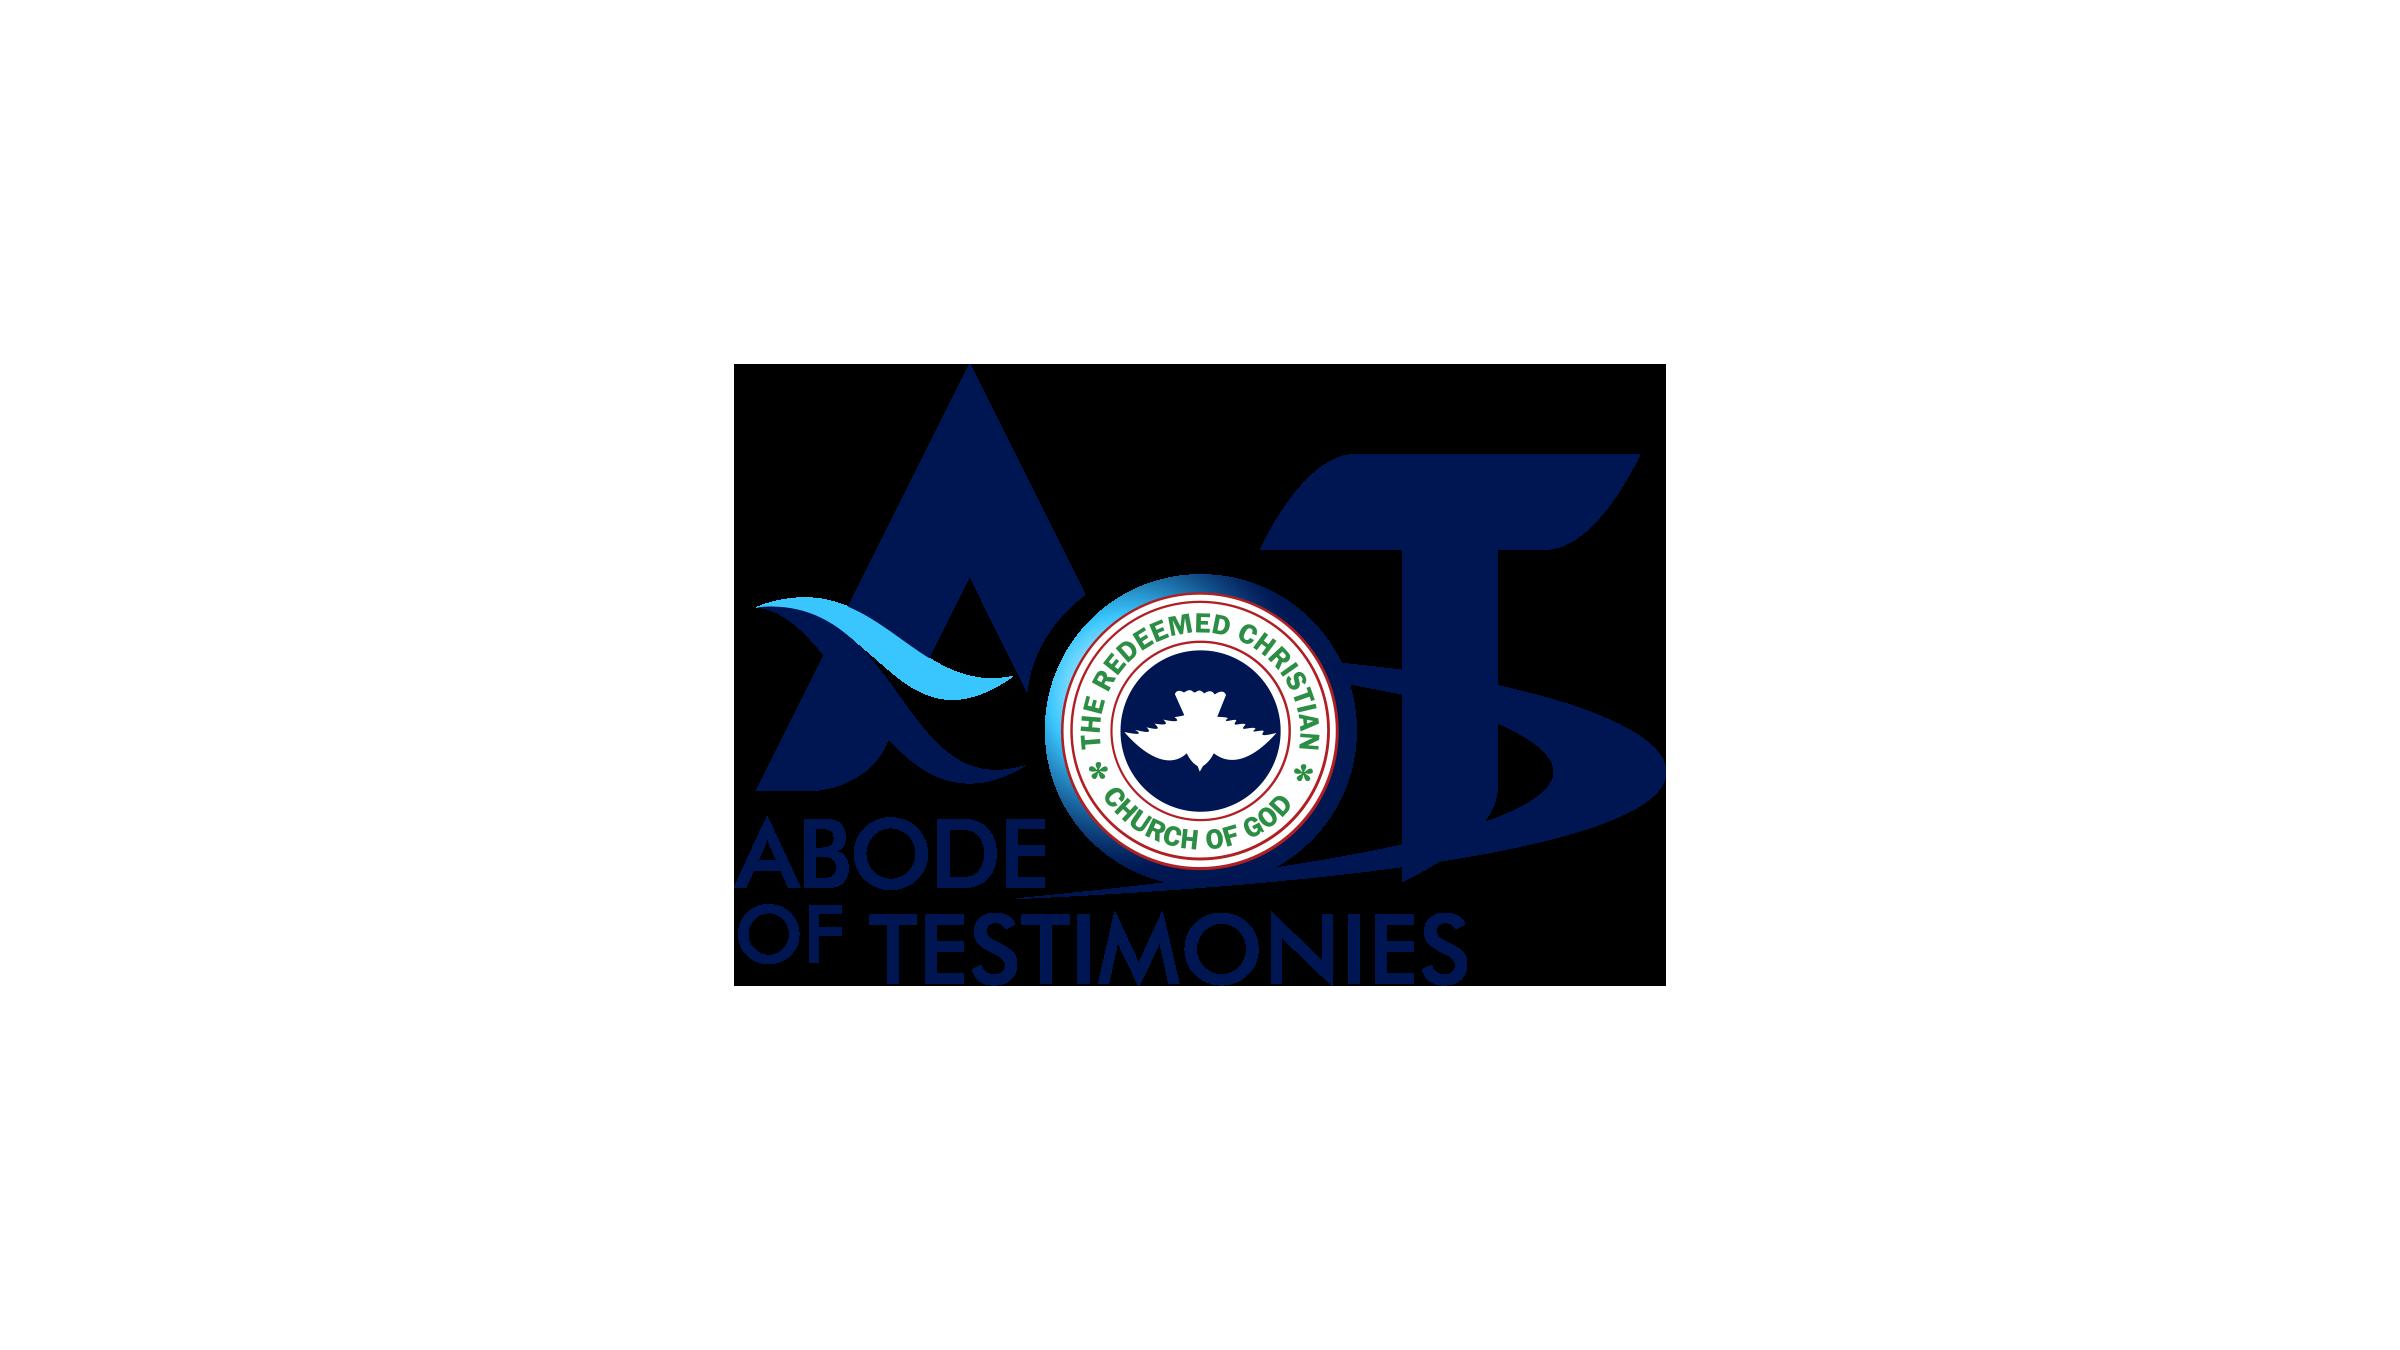 RCCG Abode of Testimonies